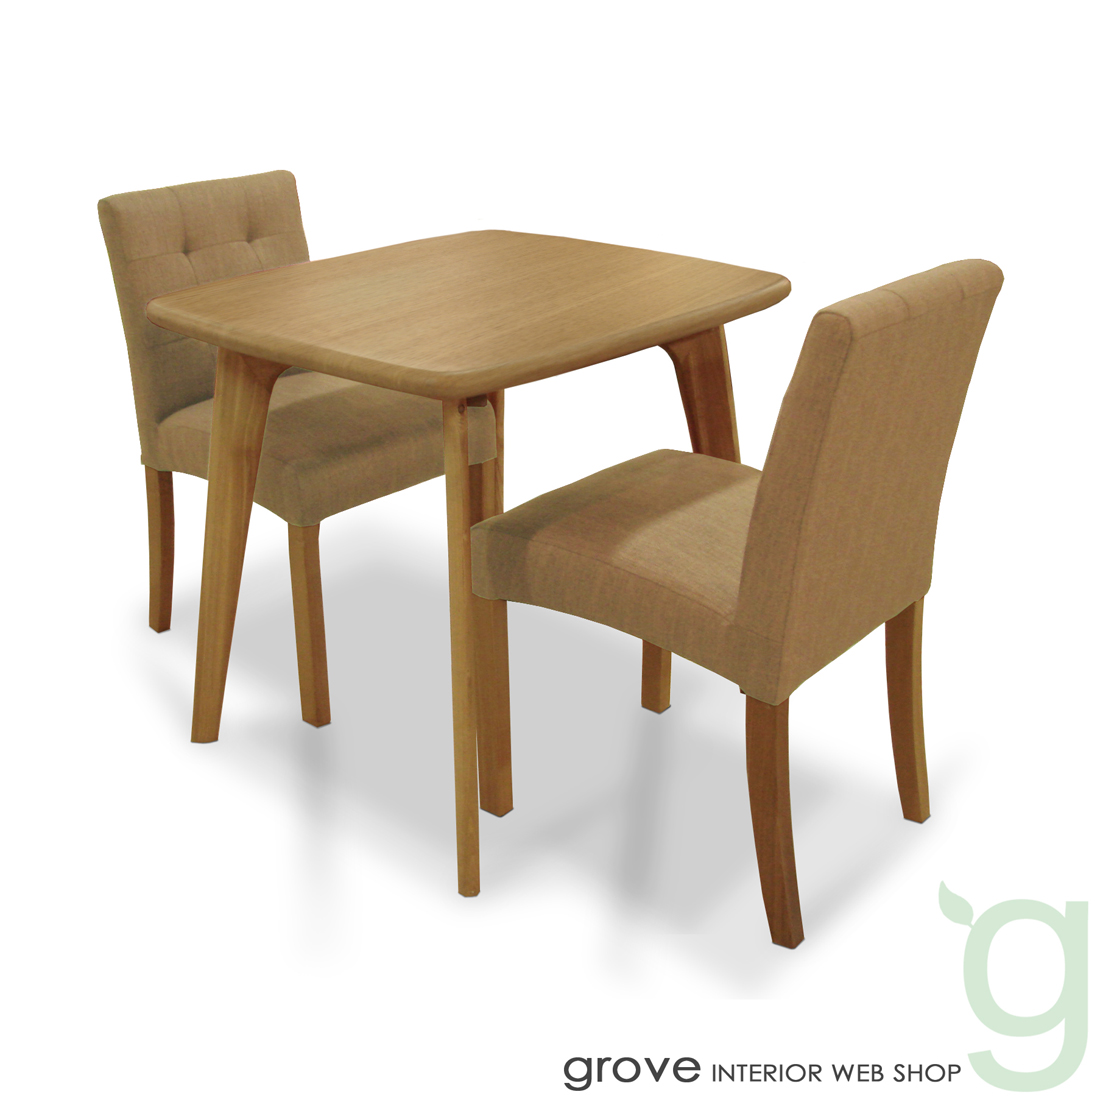 ■CL8 ダイニング3点セット■チェア張り地:ベージュ■テーブル幅80cmタイプ■送料無料■北欧家具 テイスト■北欧 モダン カントリー■木製テーブル 椅子 チェアー■リビングダイニング■食卓セット 食卓椅子 食卓テーブル